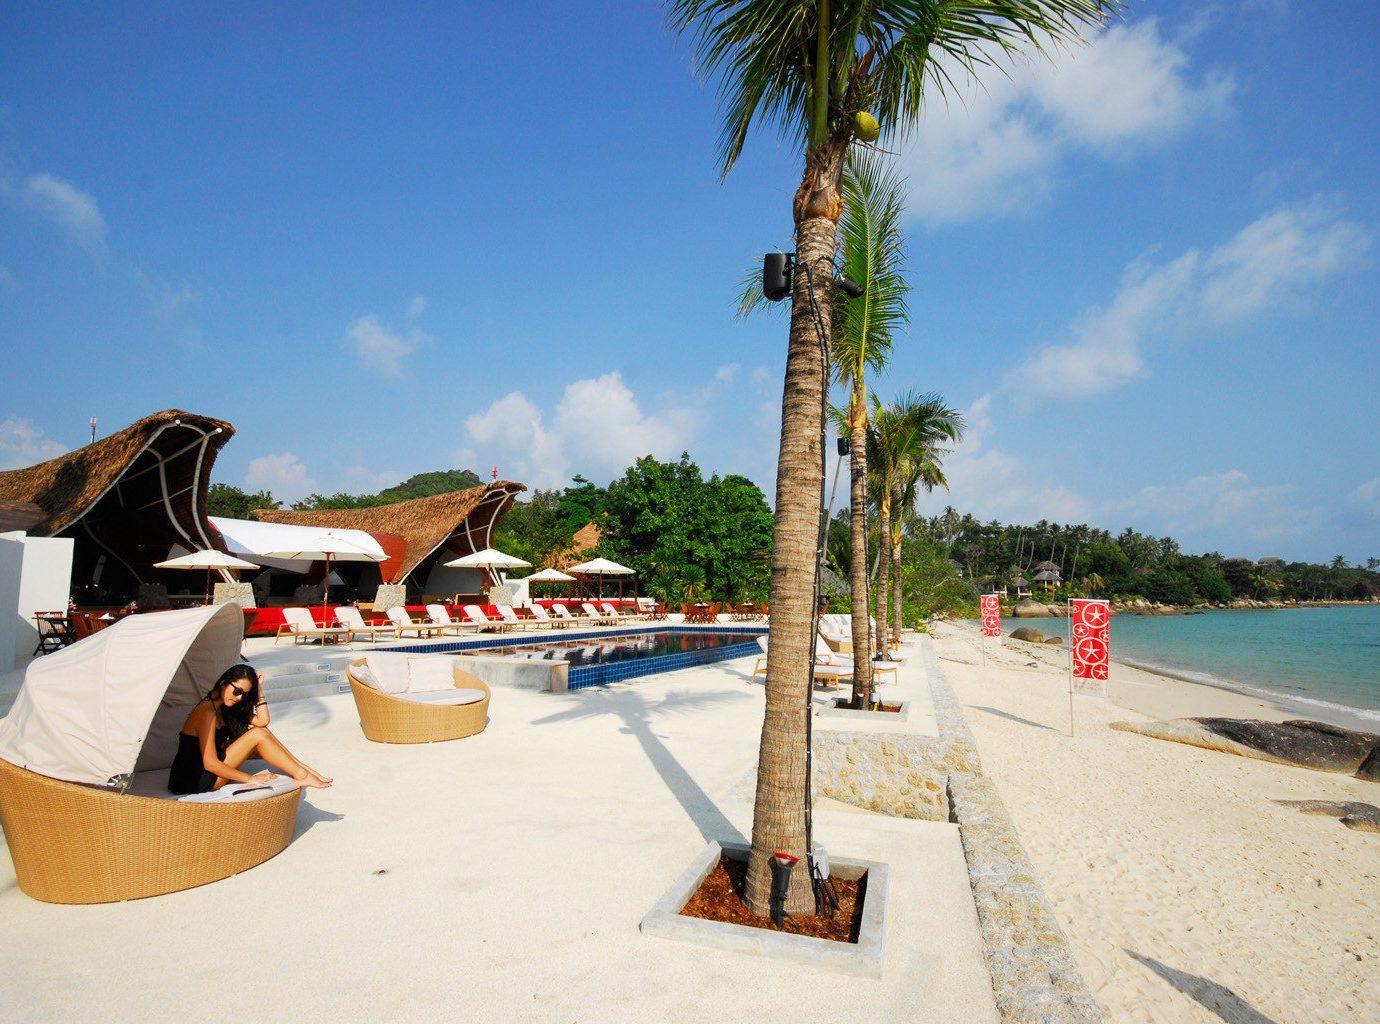 Beach Beachfront Hip Island Ocean Outdoor Activities Tropical sky leisure Sea Resort arecales caribbean Coast walkway boardwalk travel swimming pool tree shore plant